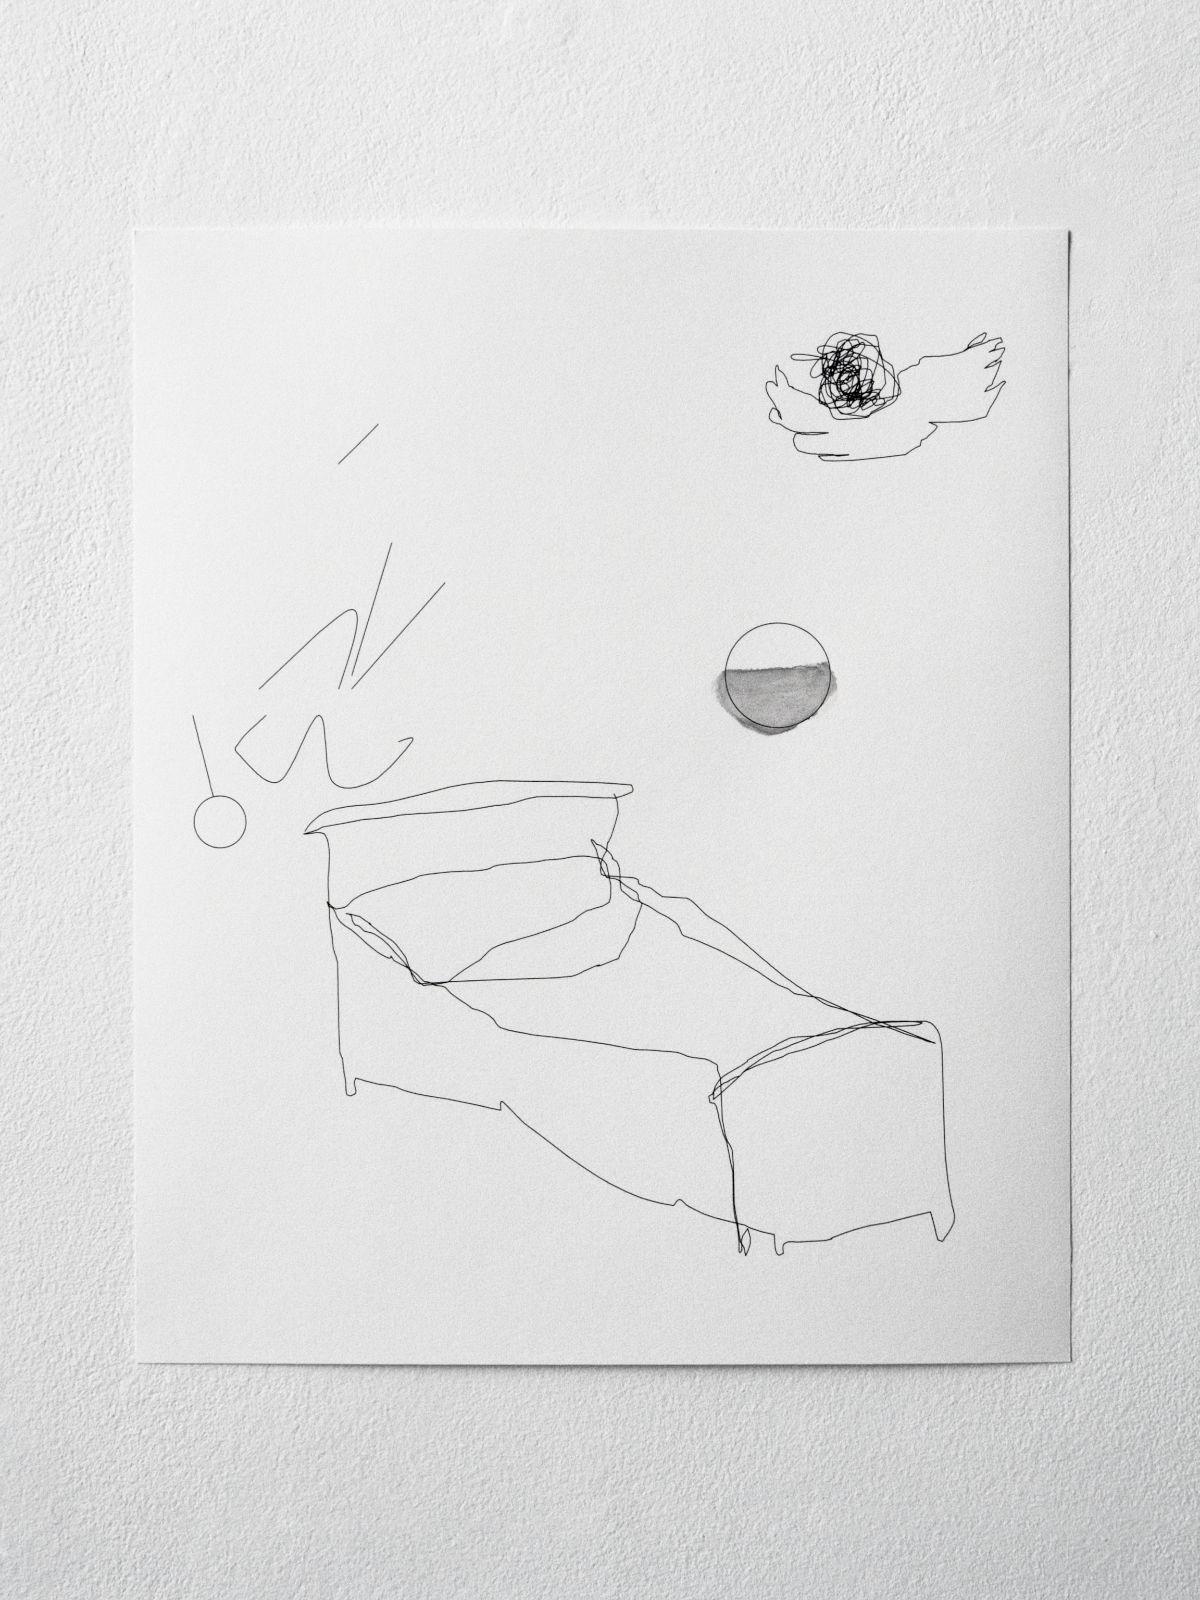 Halfslaap (Half sleep), 2005, inkjet and watercolour on paper, frame, 53 x 44 cm (50 x 41 cm), edition of 2